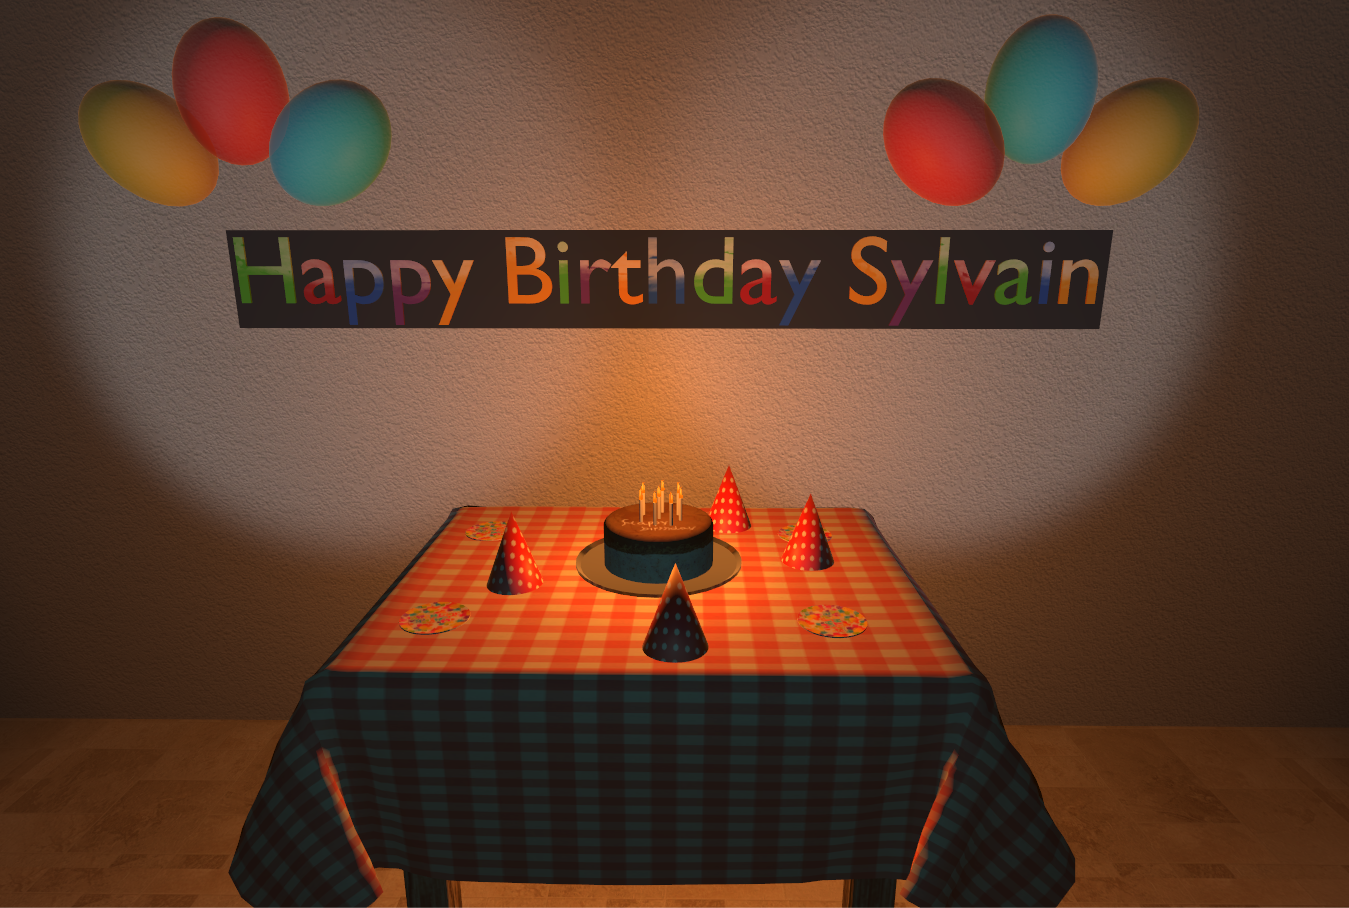 BirthdaySylvain.PNG